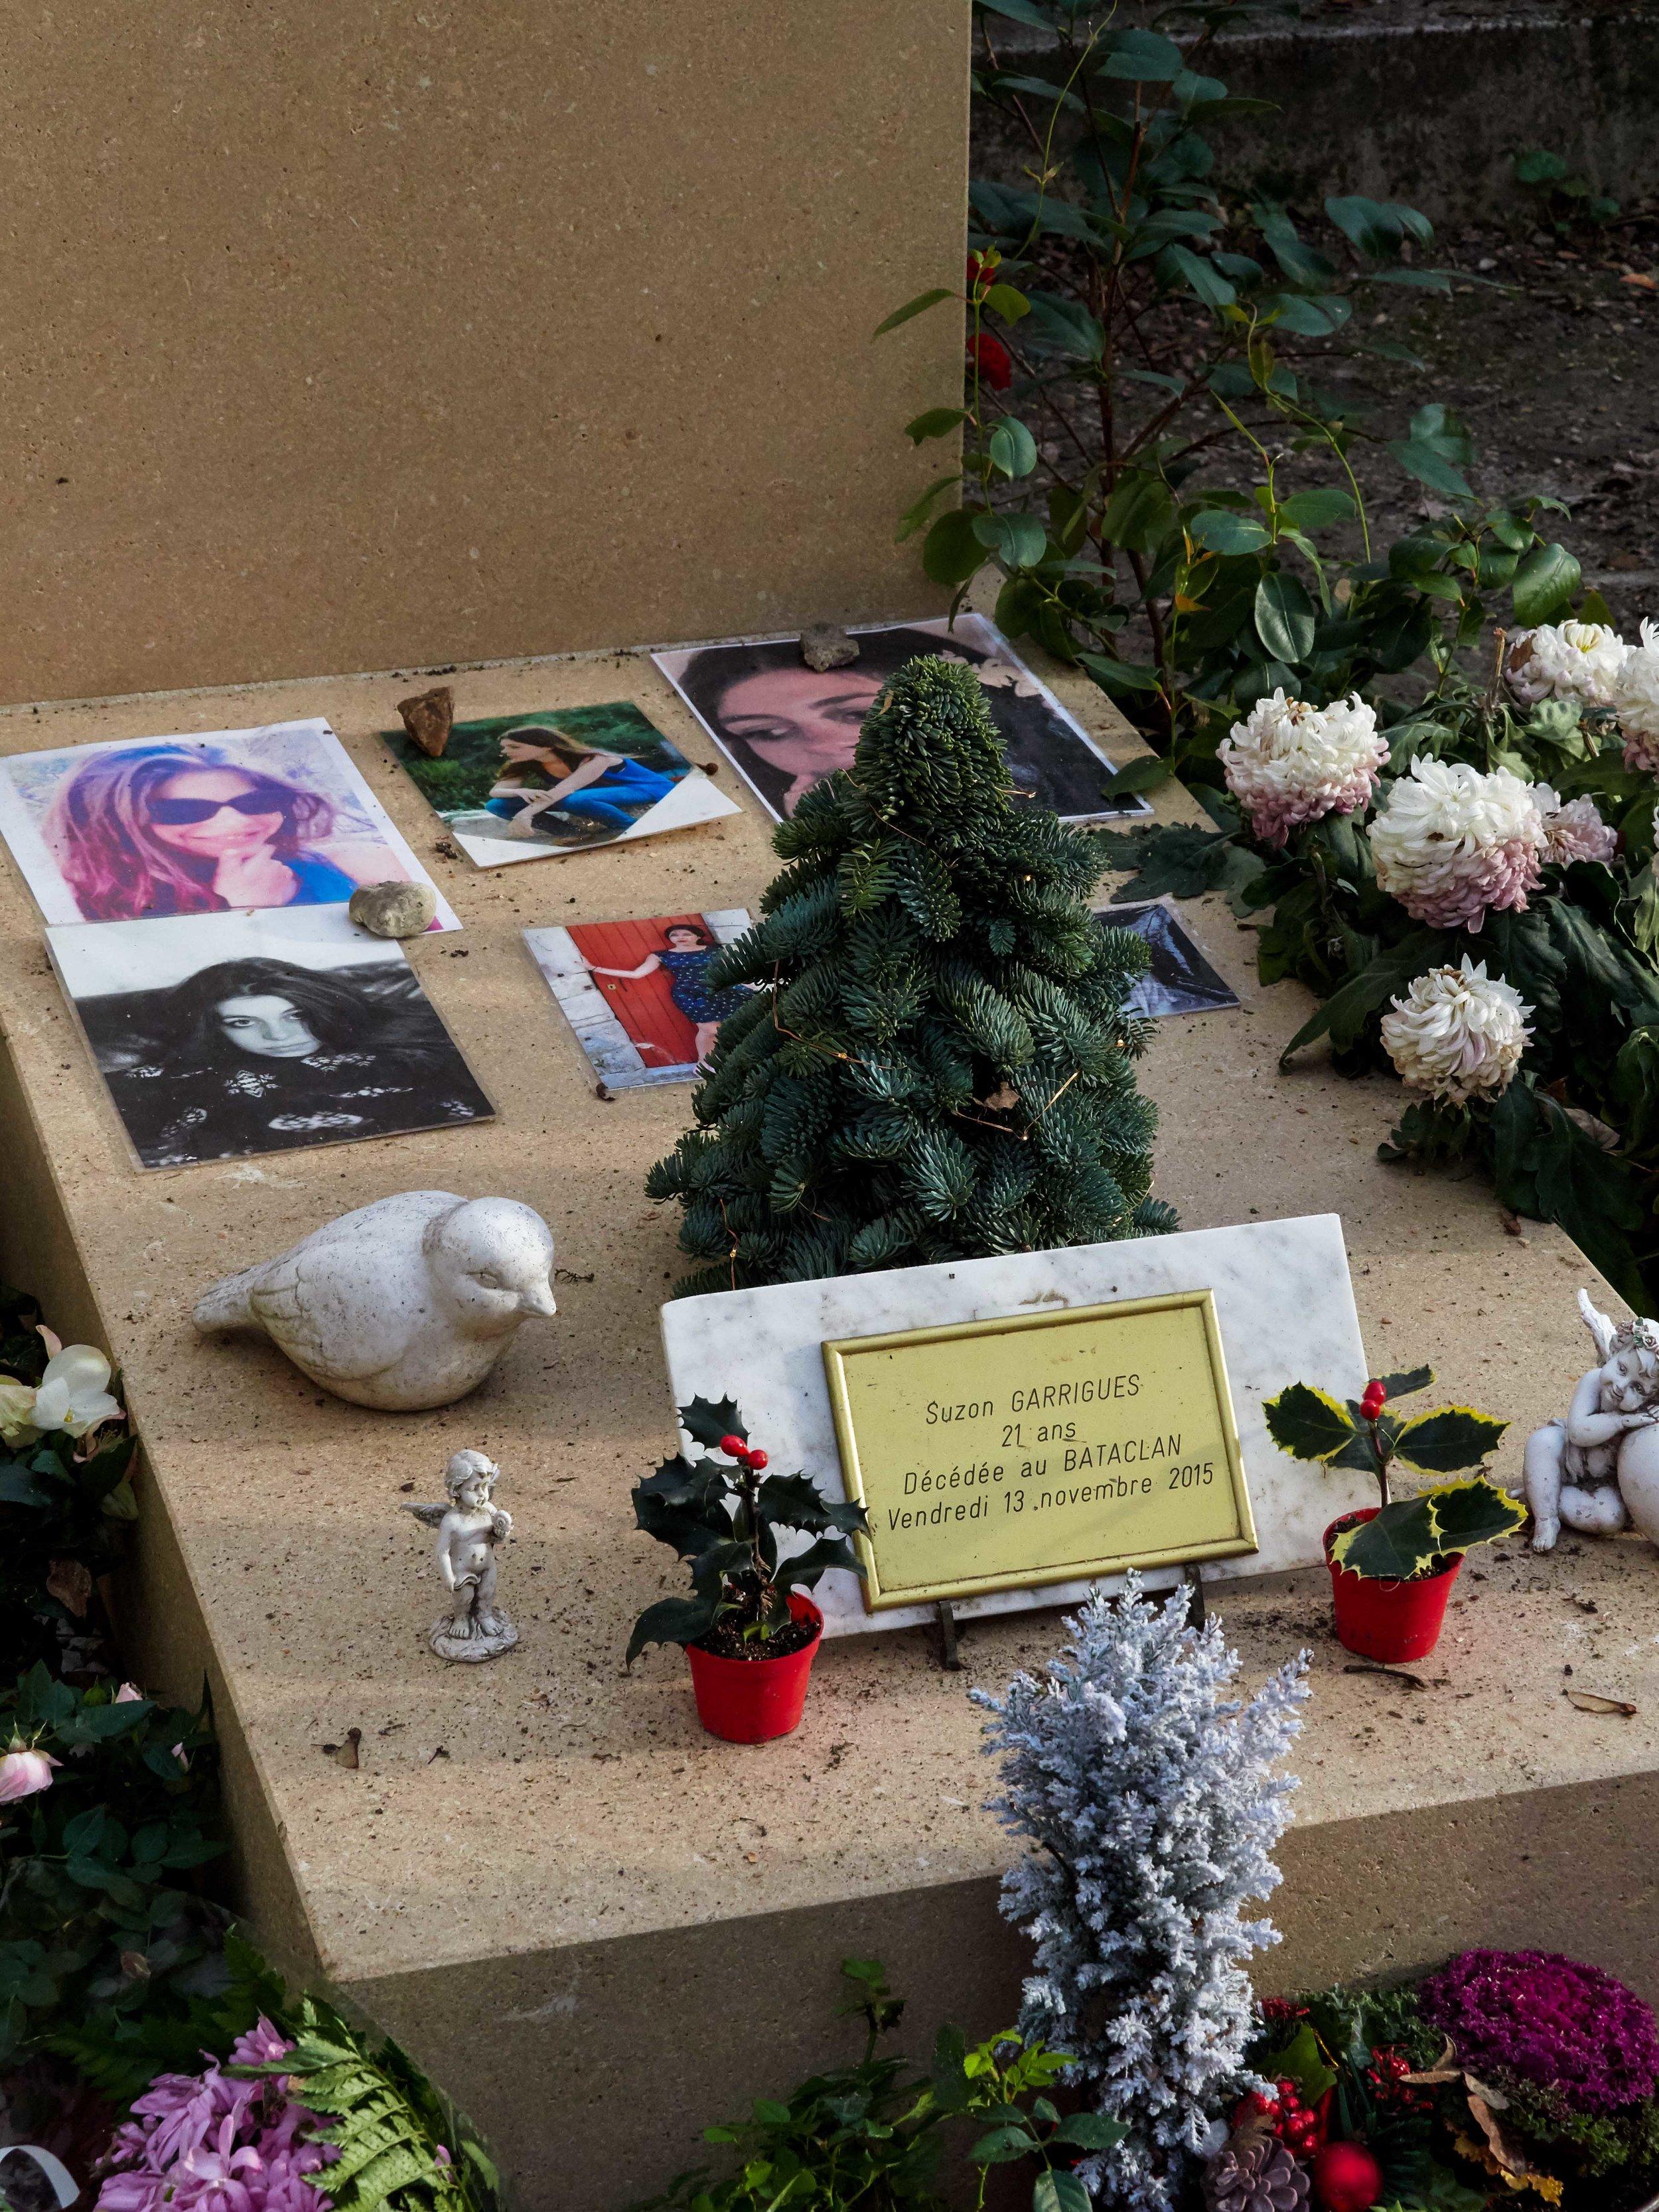 Memory Prevails Over Terrorism